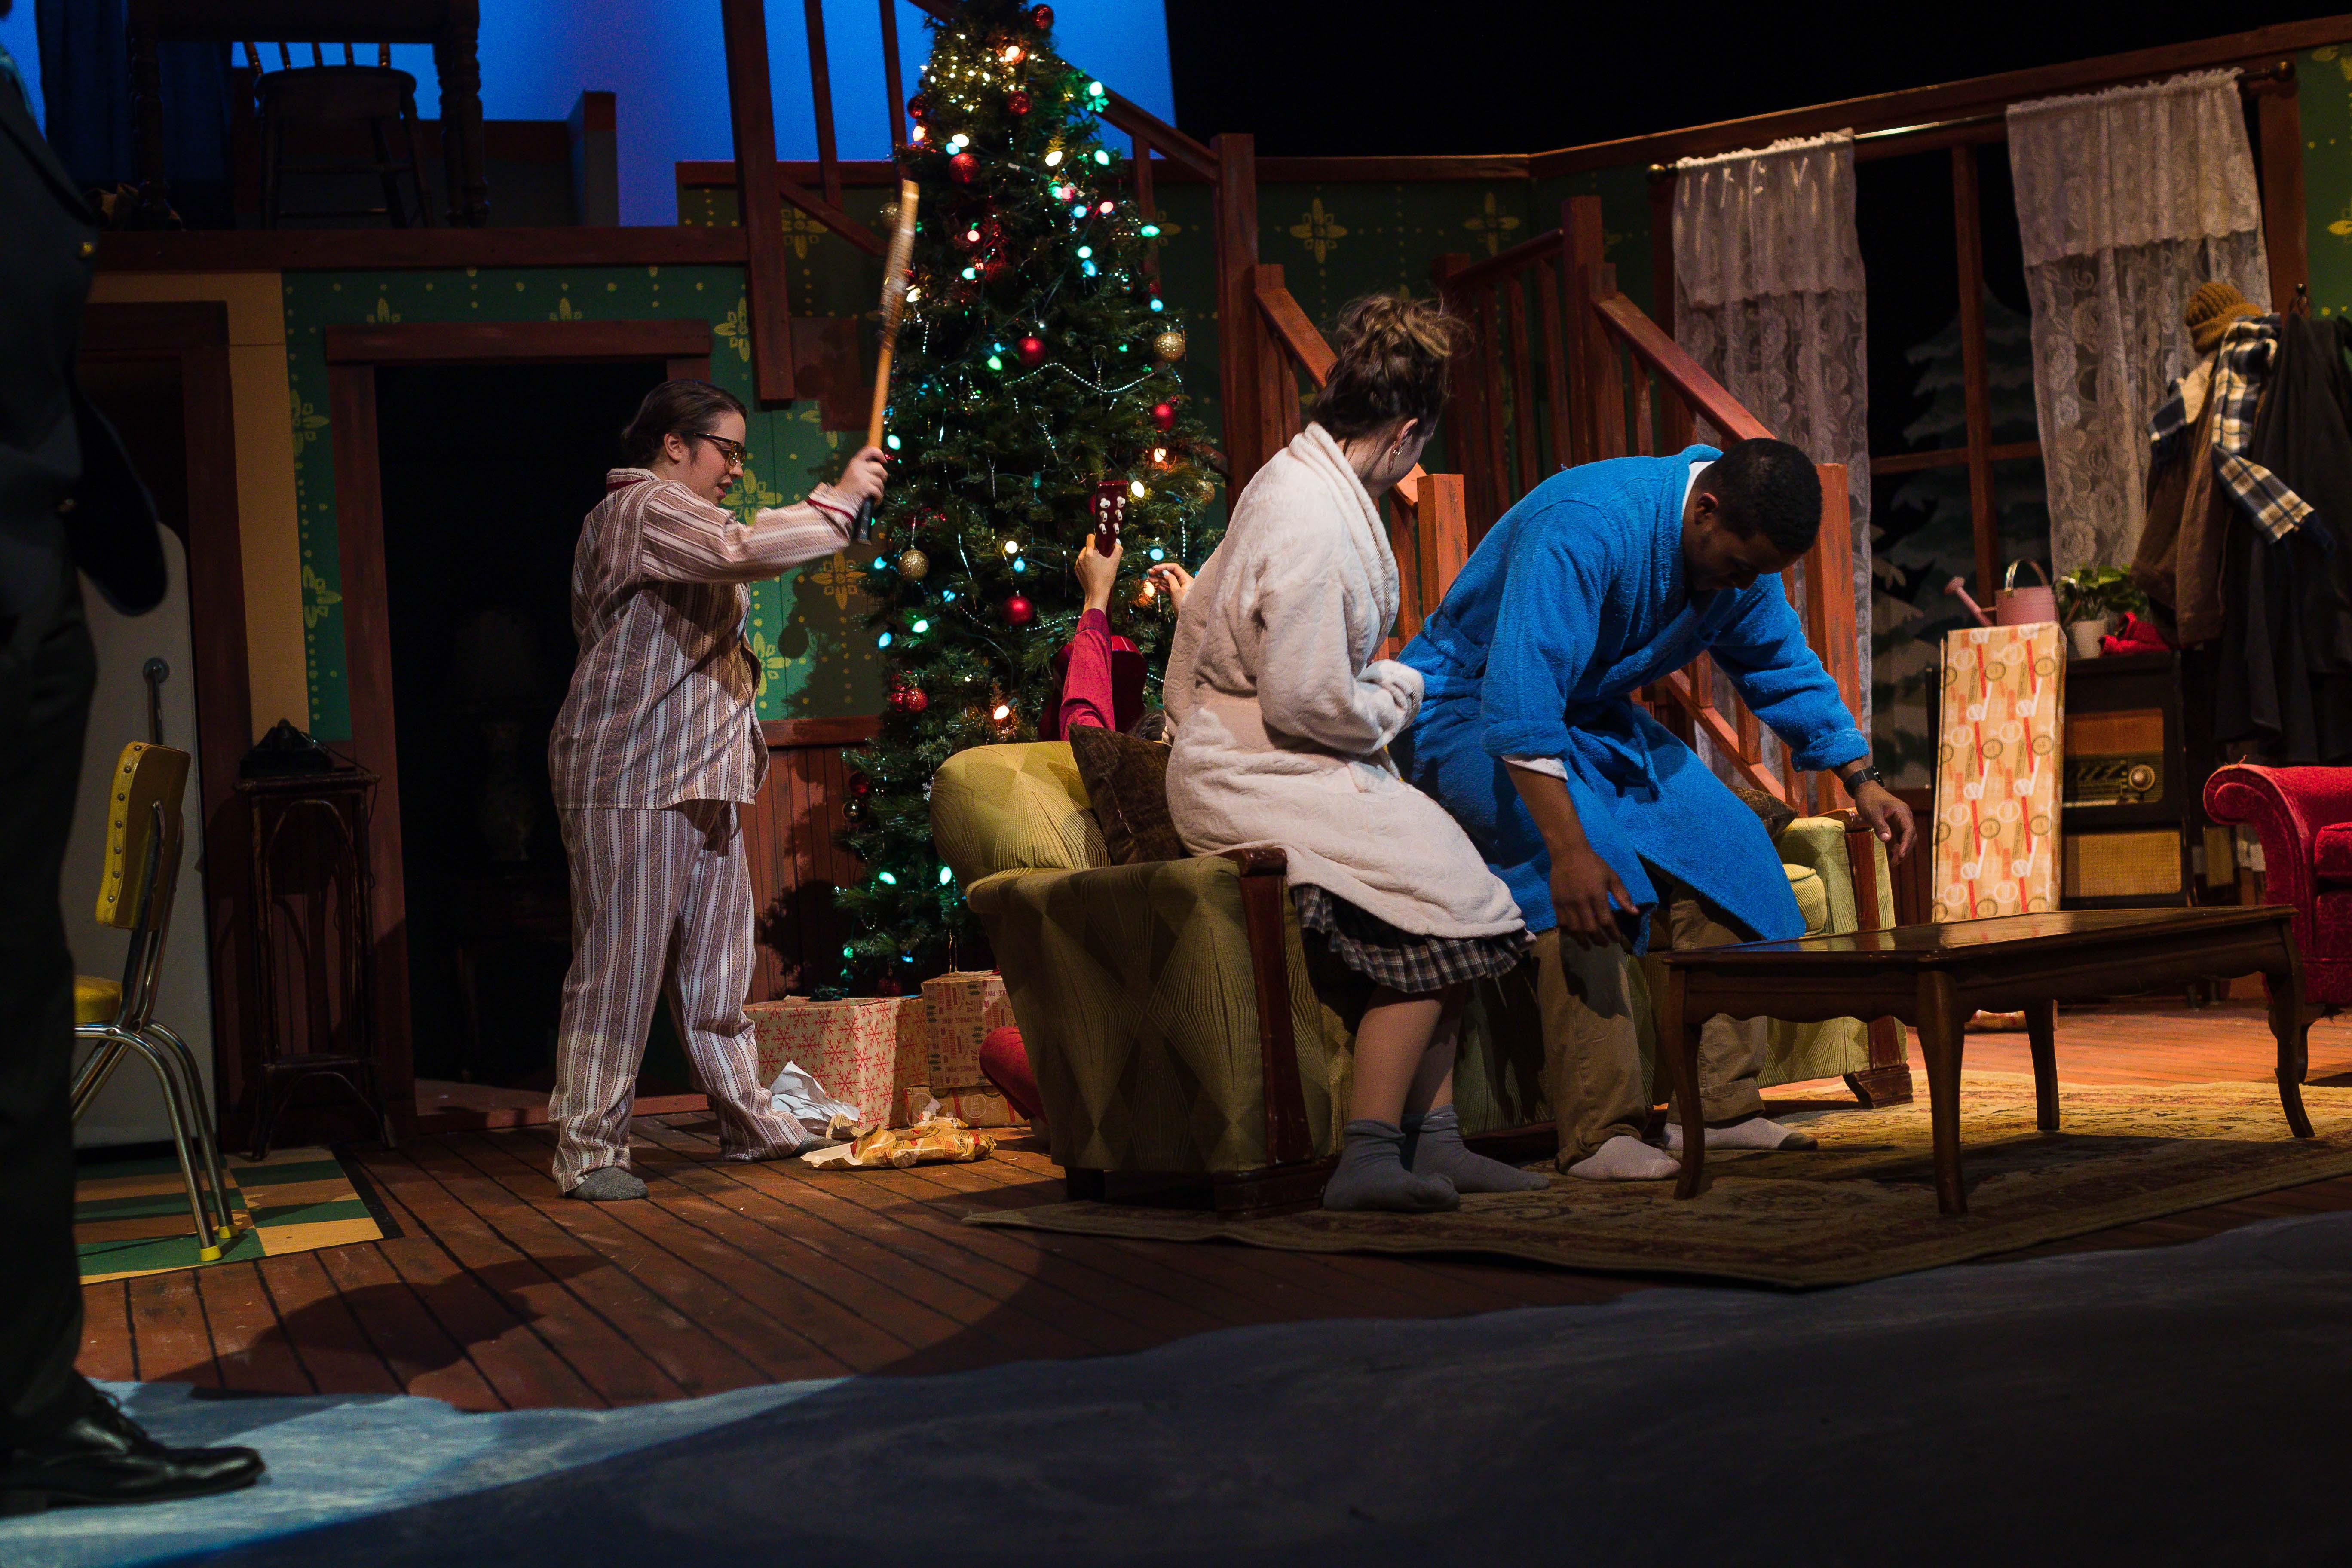 Weaver_Christmasshoot-_MG_1504